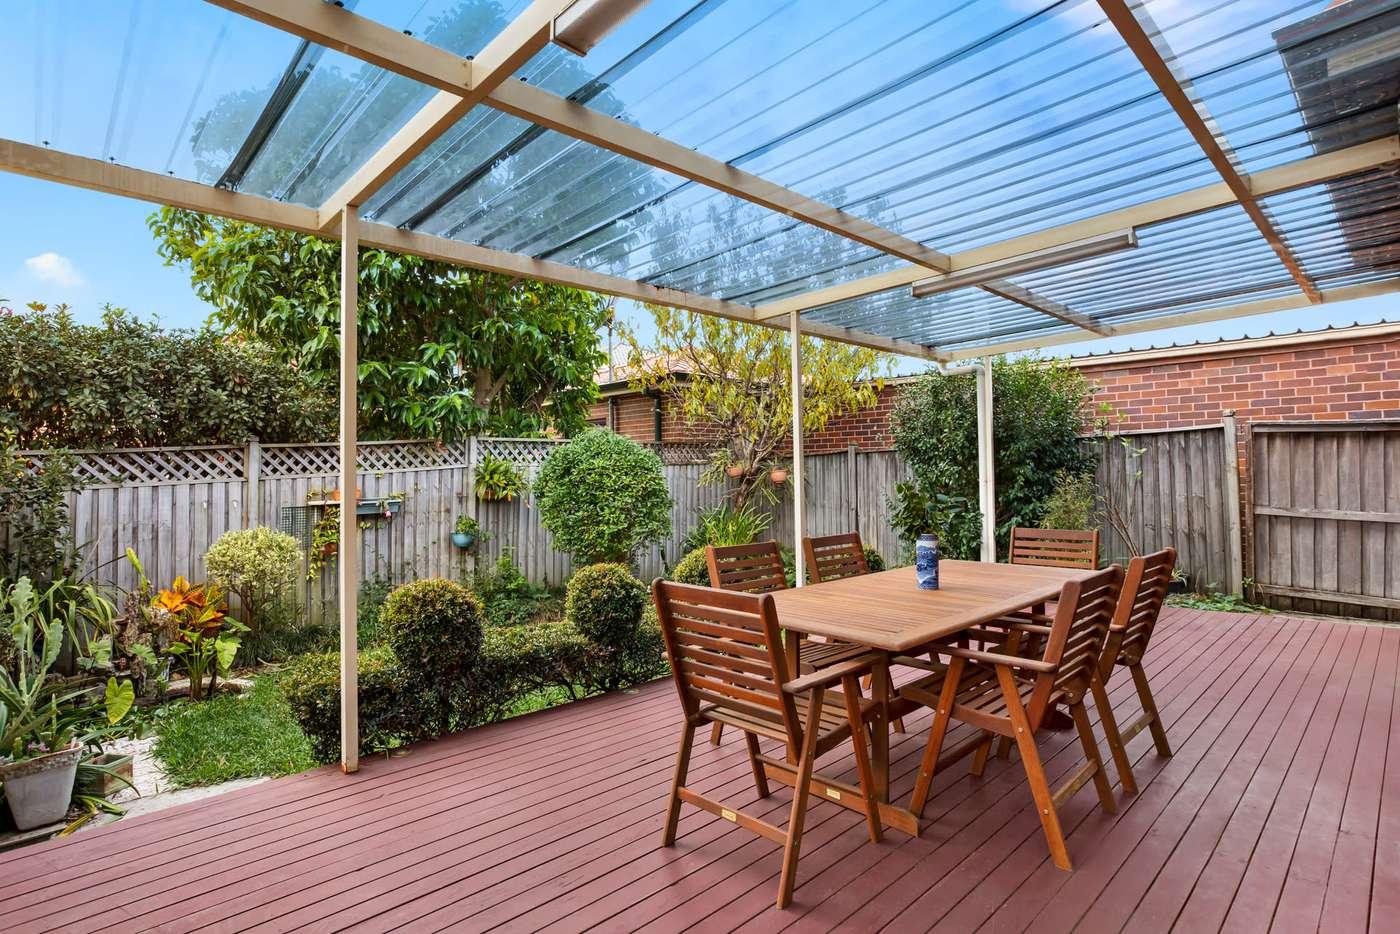 Sixth view of Homely house listing, 18 Gartfern Avenue, Wareemba NSW 2046